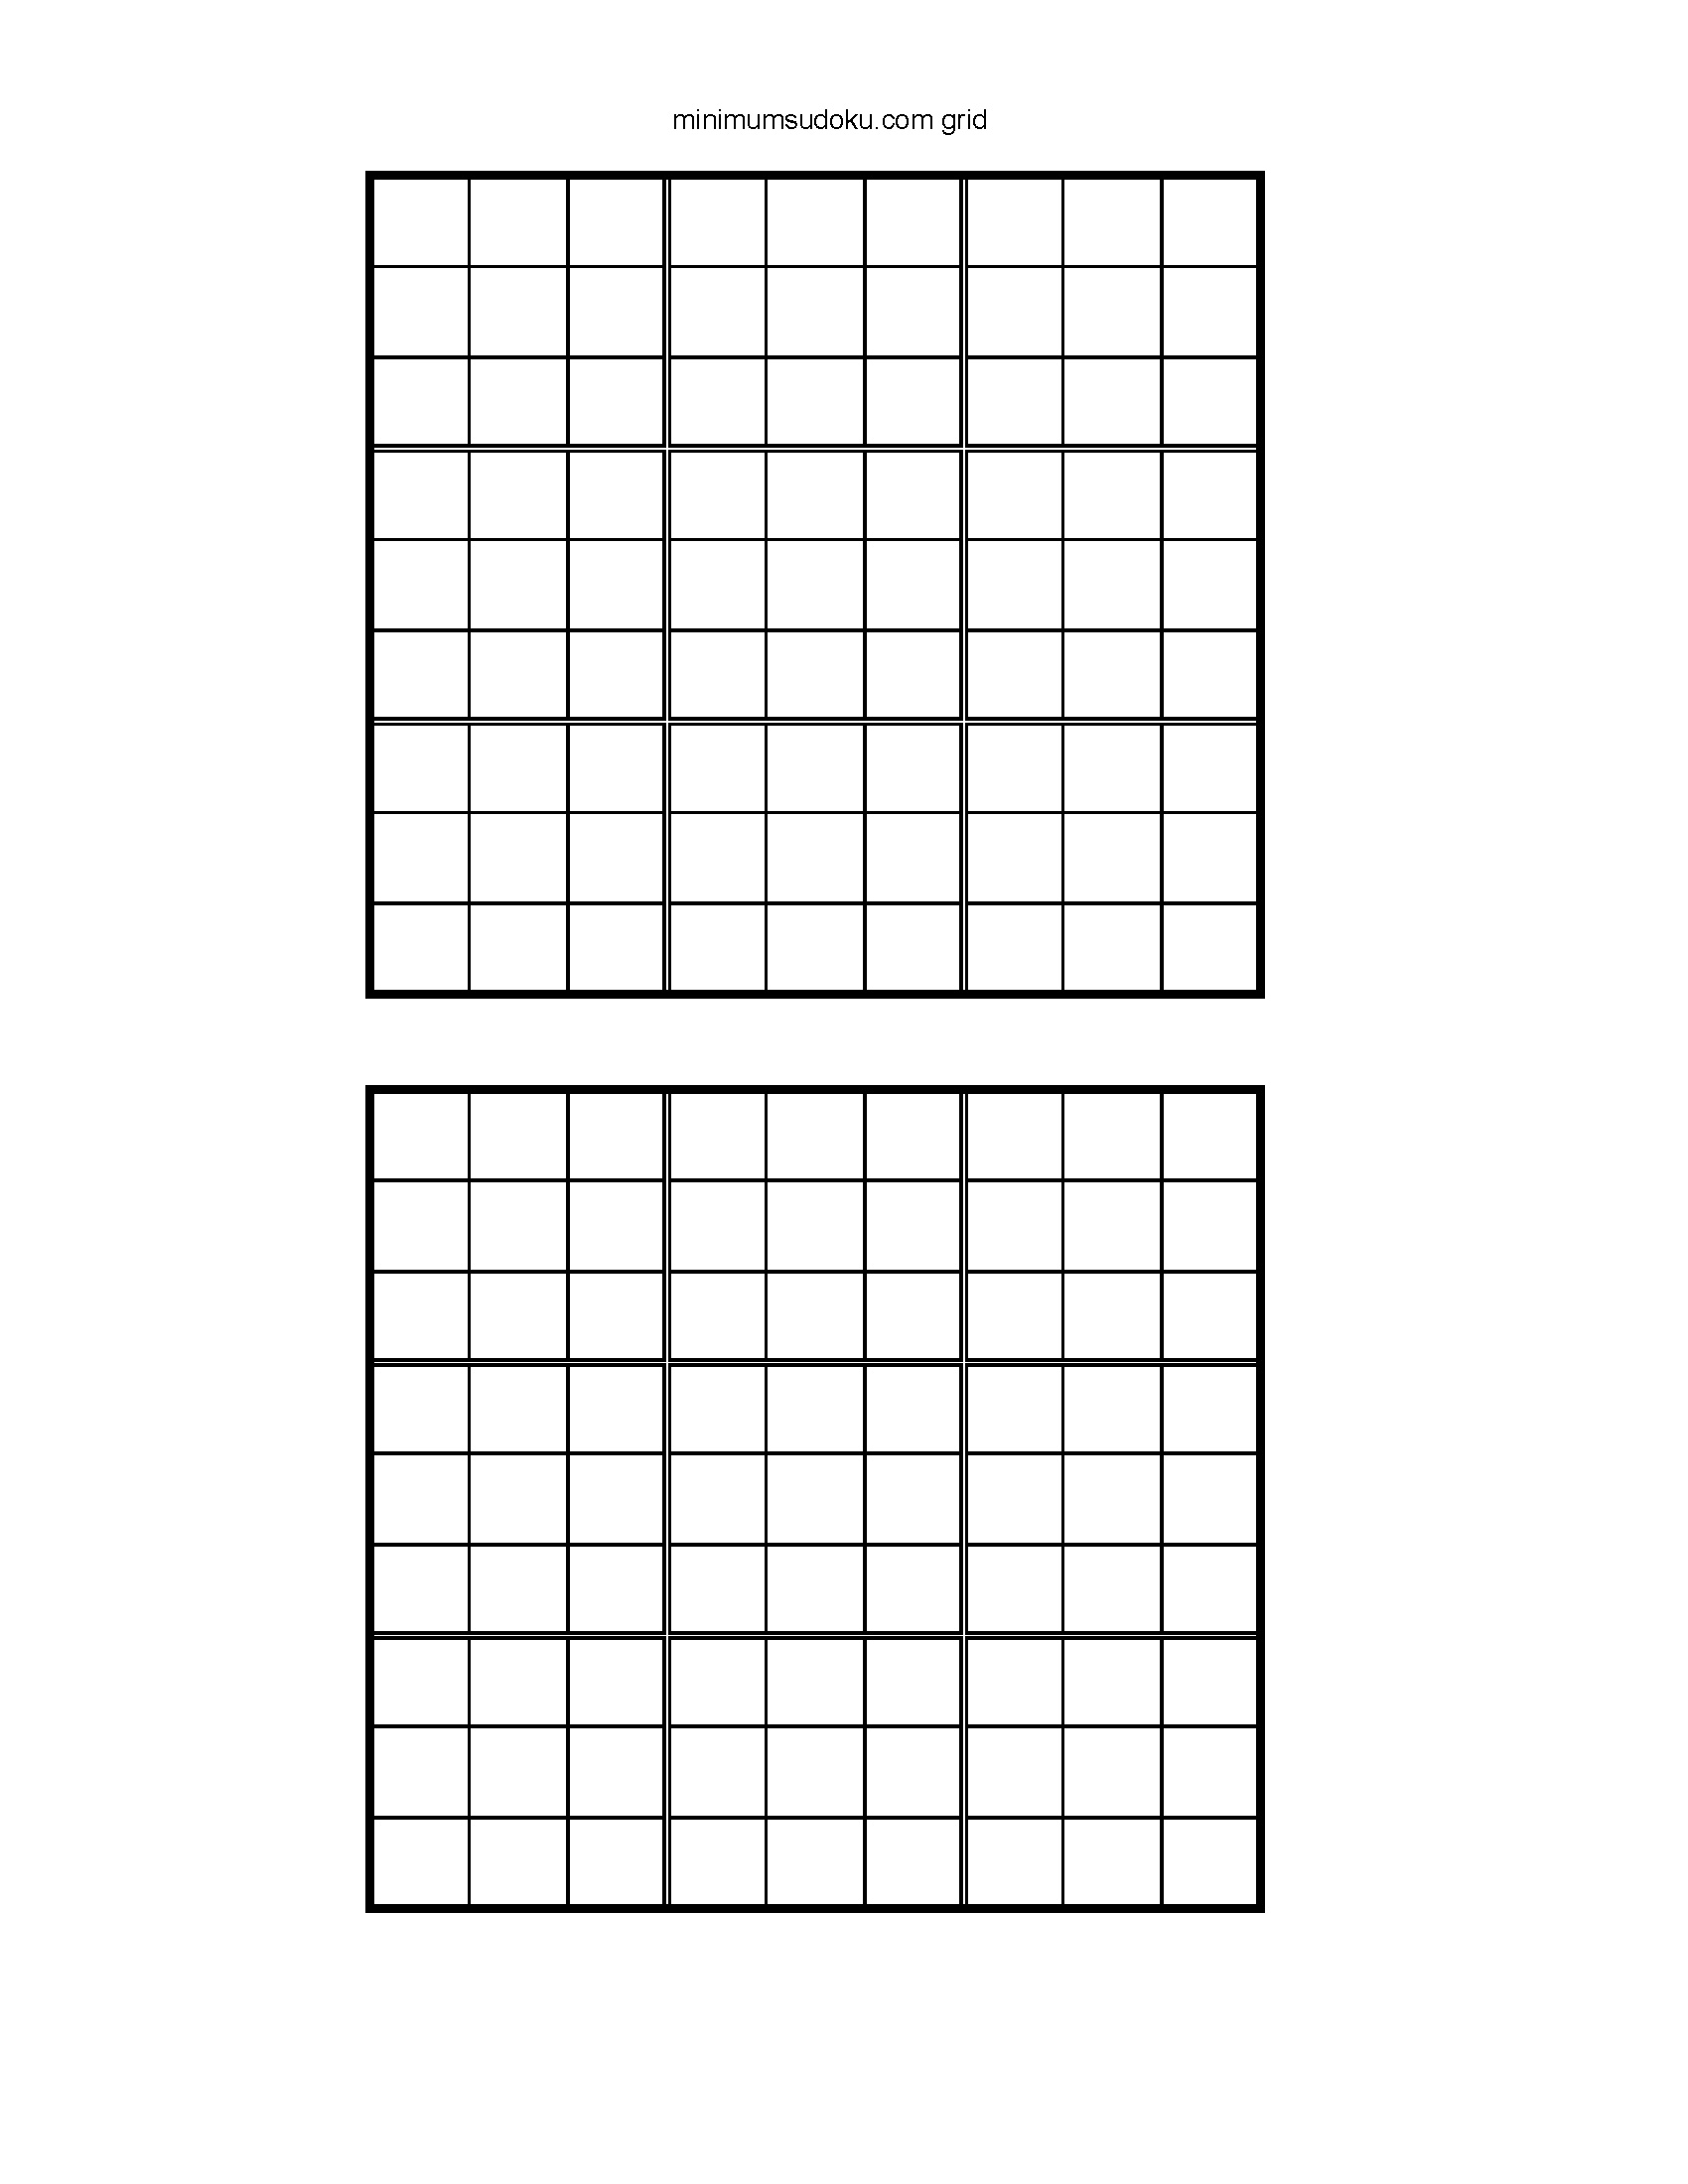 Printable Blank Sudoku Grids 2 Per Page